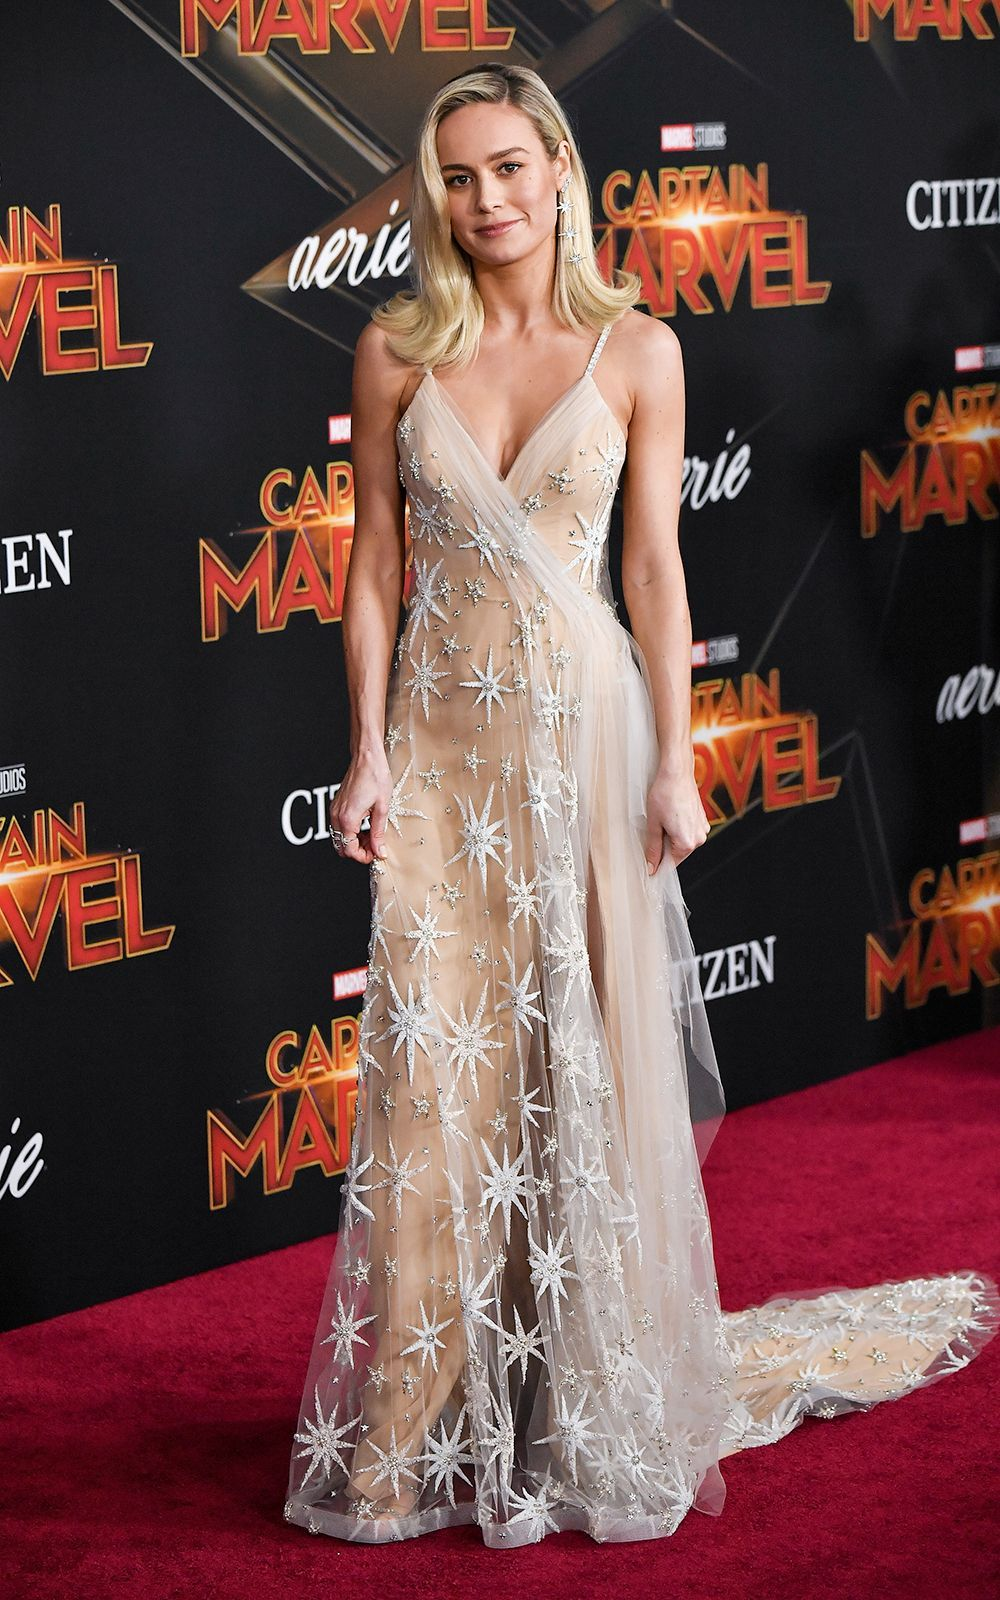 Photo of Brie Larson – PICS Brie Larson – PICS – Hollywood Leben #Brie #Celeb …